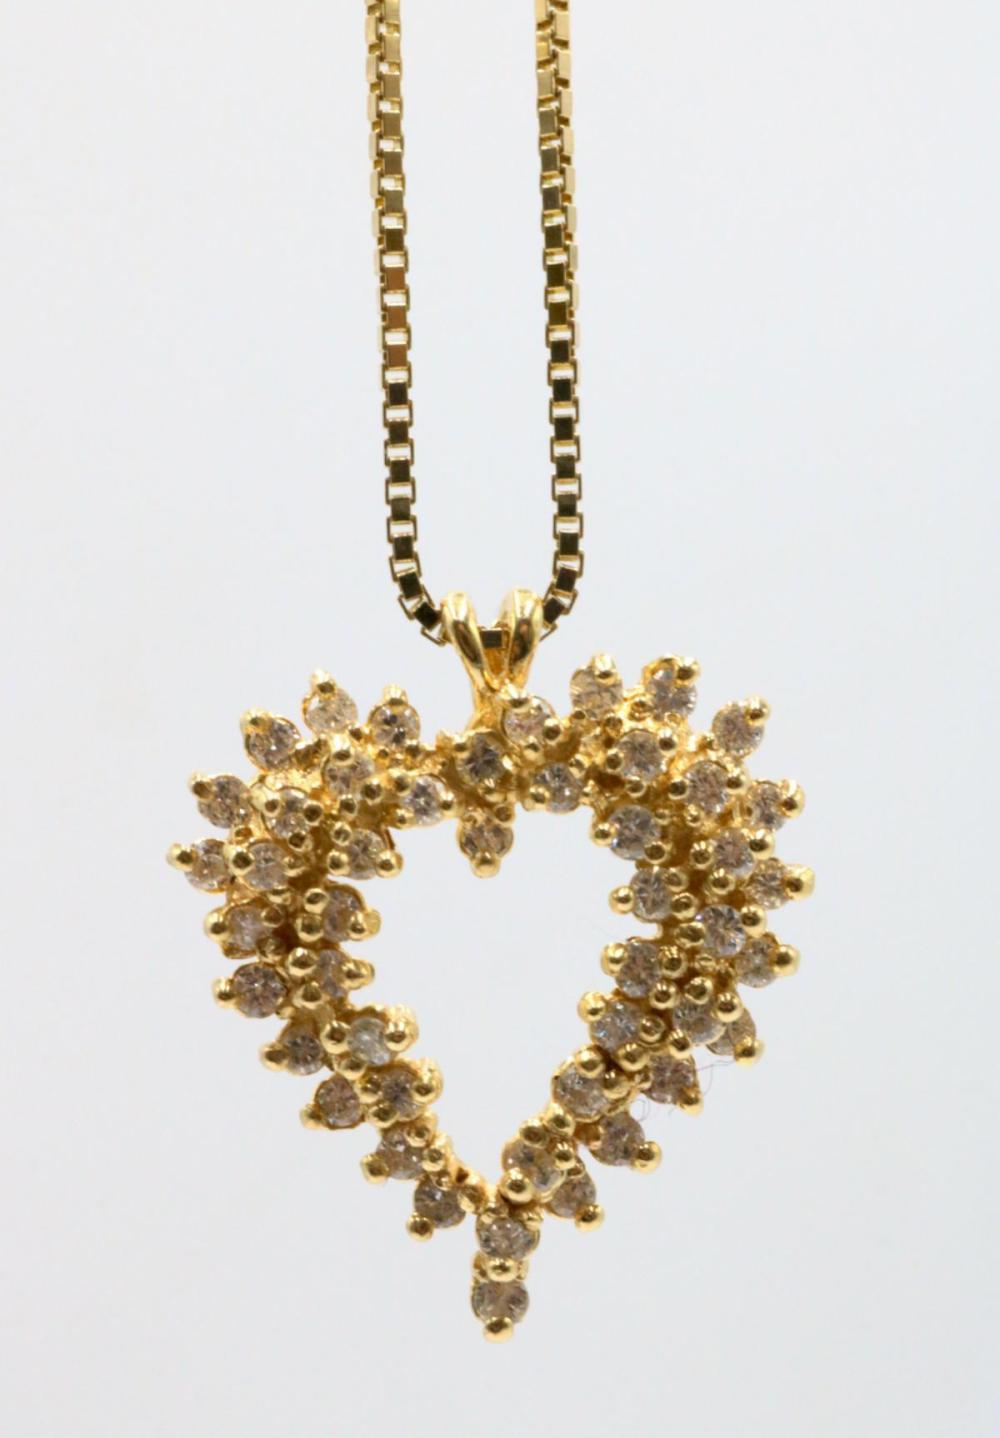 14Kt Diamond Heart Pendant w/ Necklace